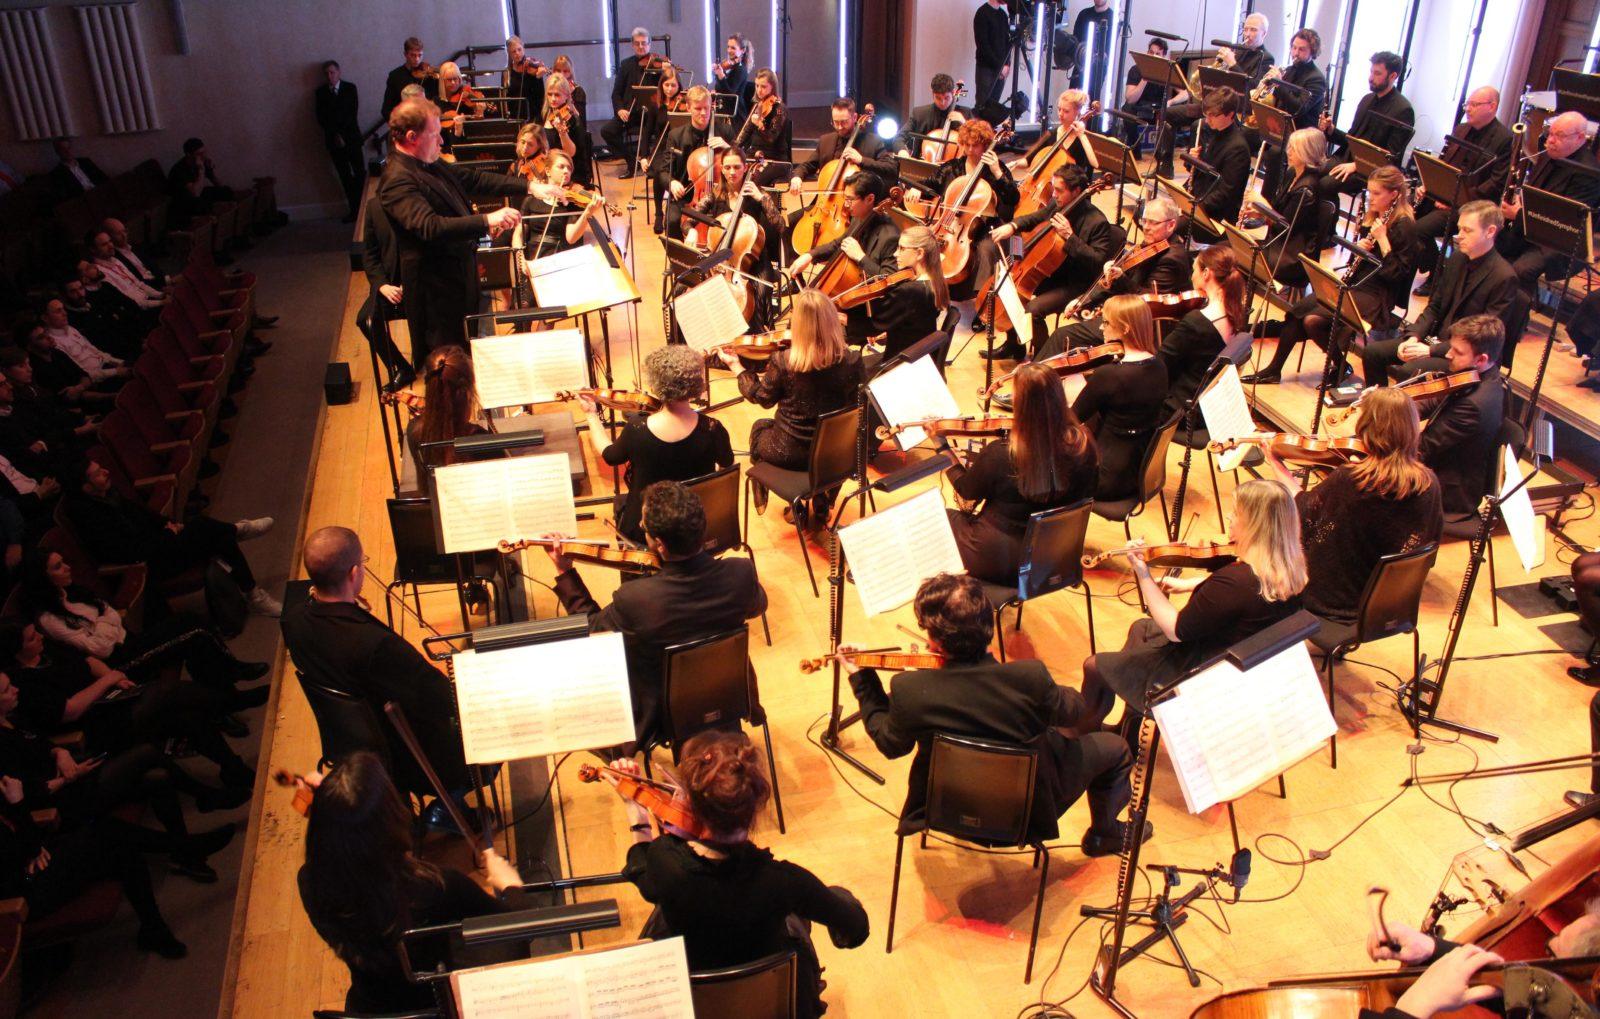 cadogan Hall Franz Schubert 8ème symphonie by Huawei